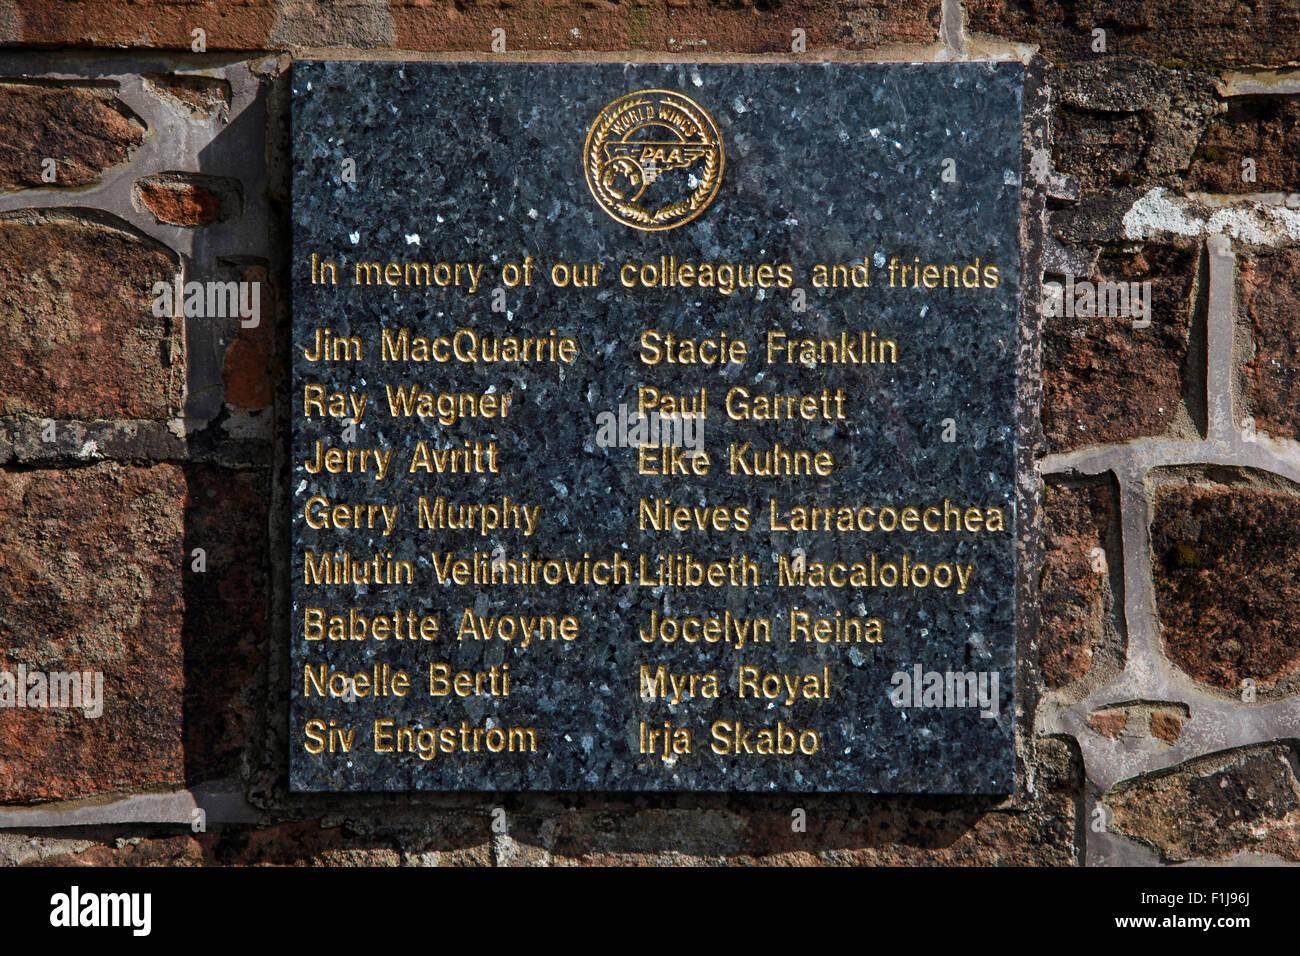 Lockerbie PanAm103 In Rememberance Memorial PAA World Wings Plaque,Scotland - Stock Image